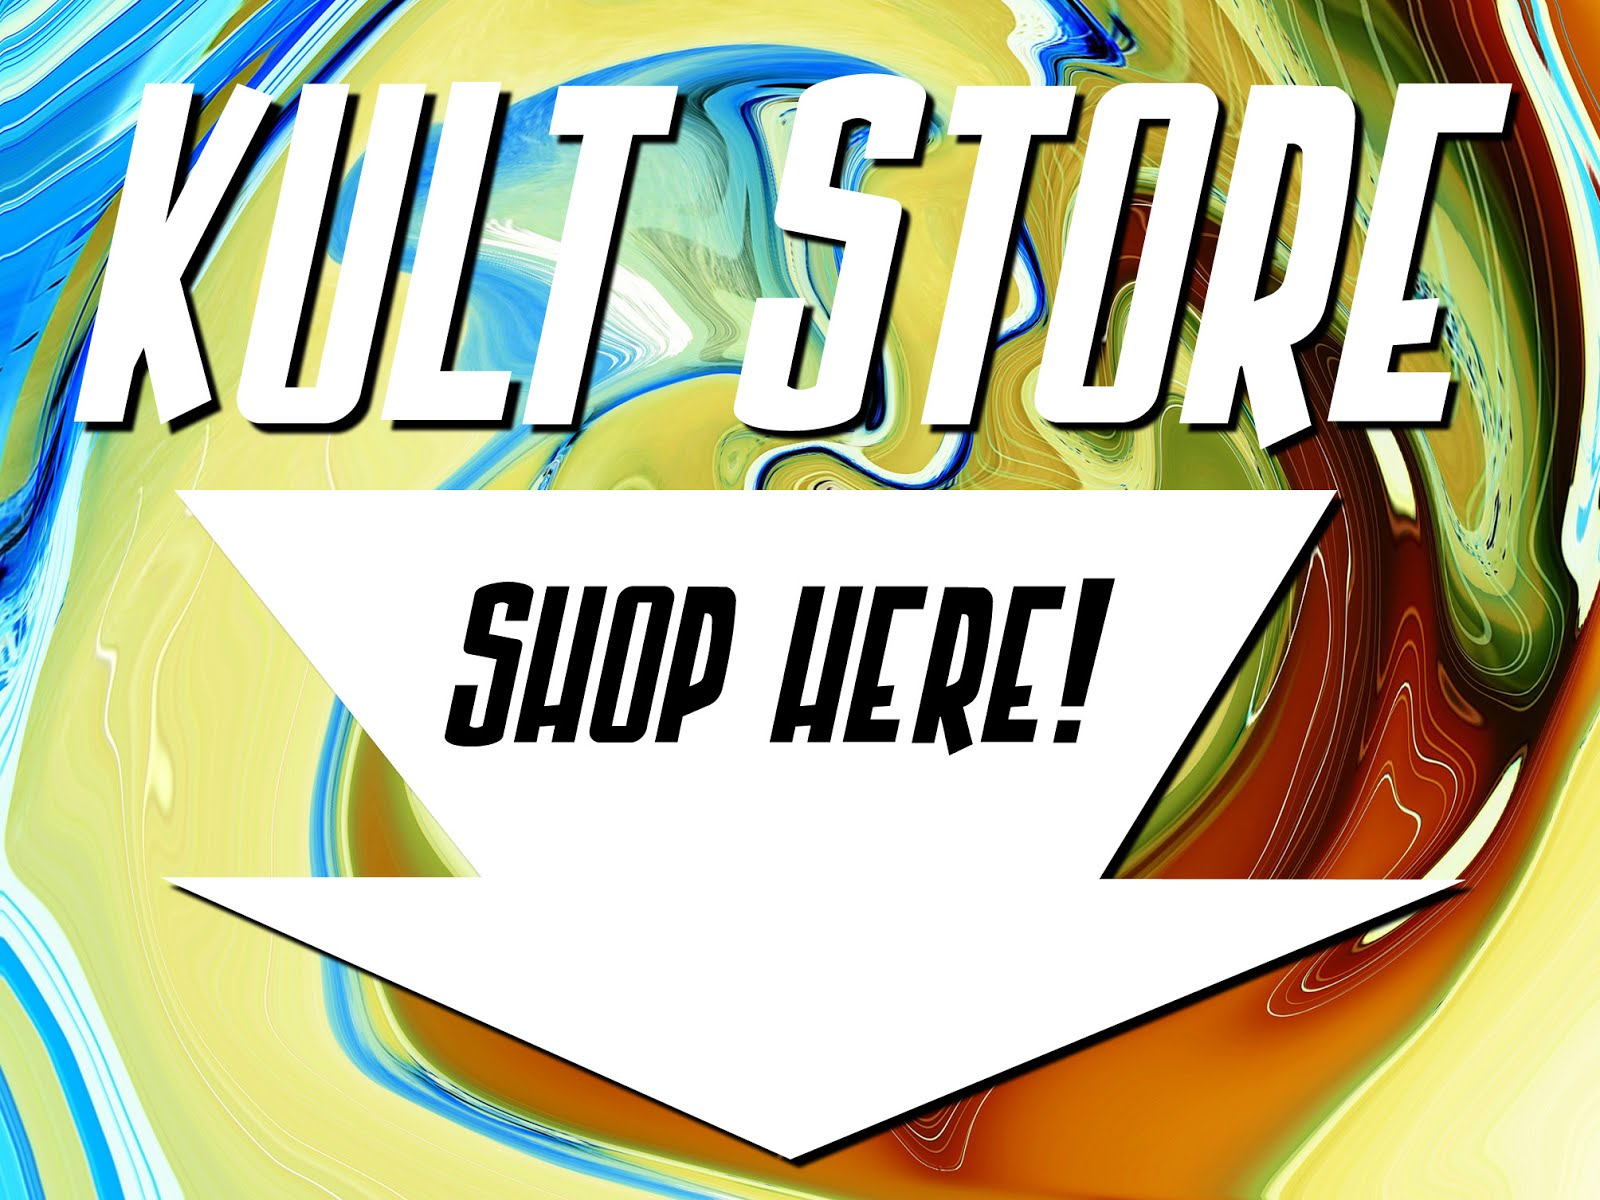 Buy Kult Creations digital publications below!